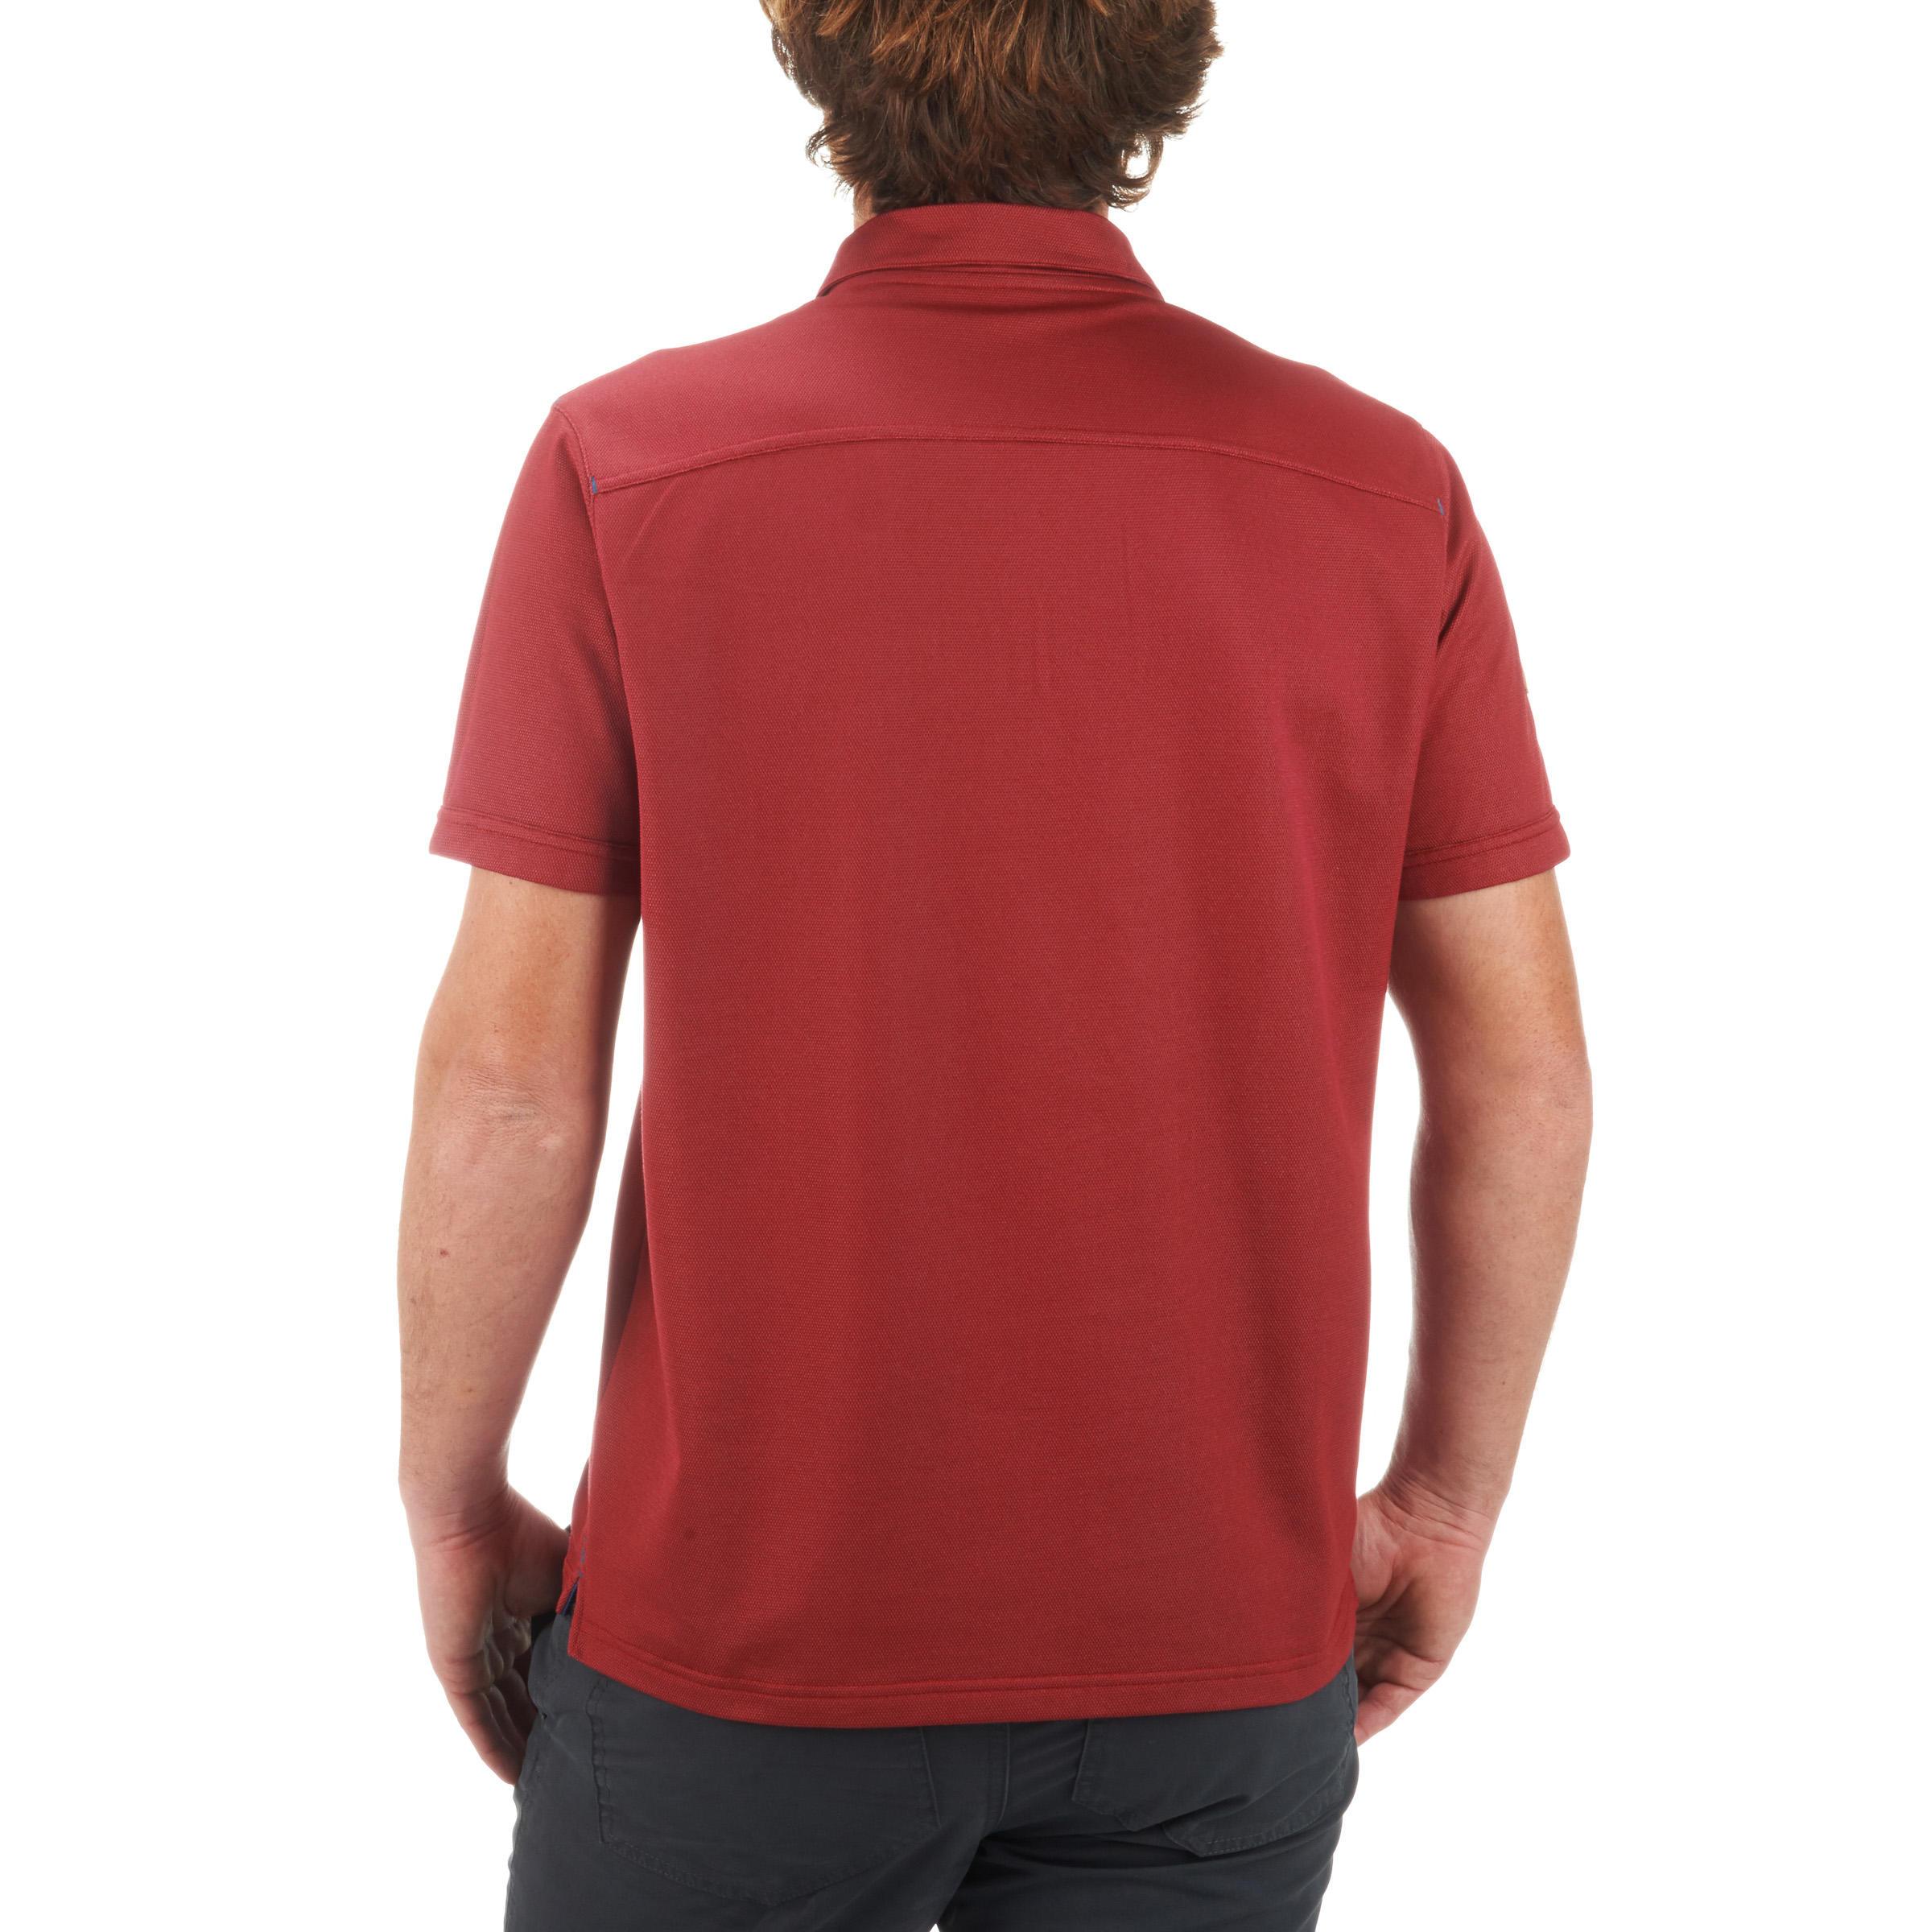 500 Arpenaz senderismo Polo para de rojo hombre lTKFc1J3